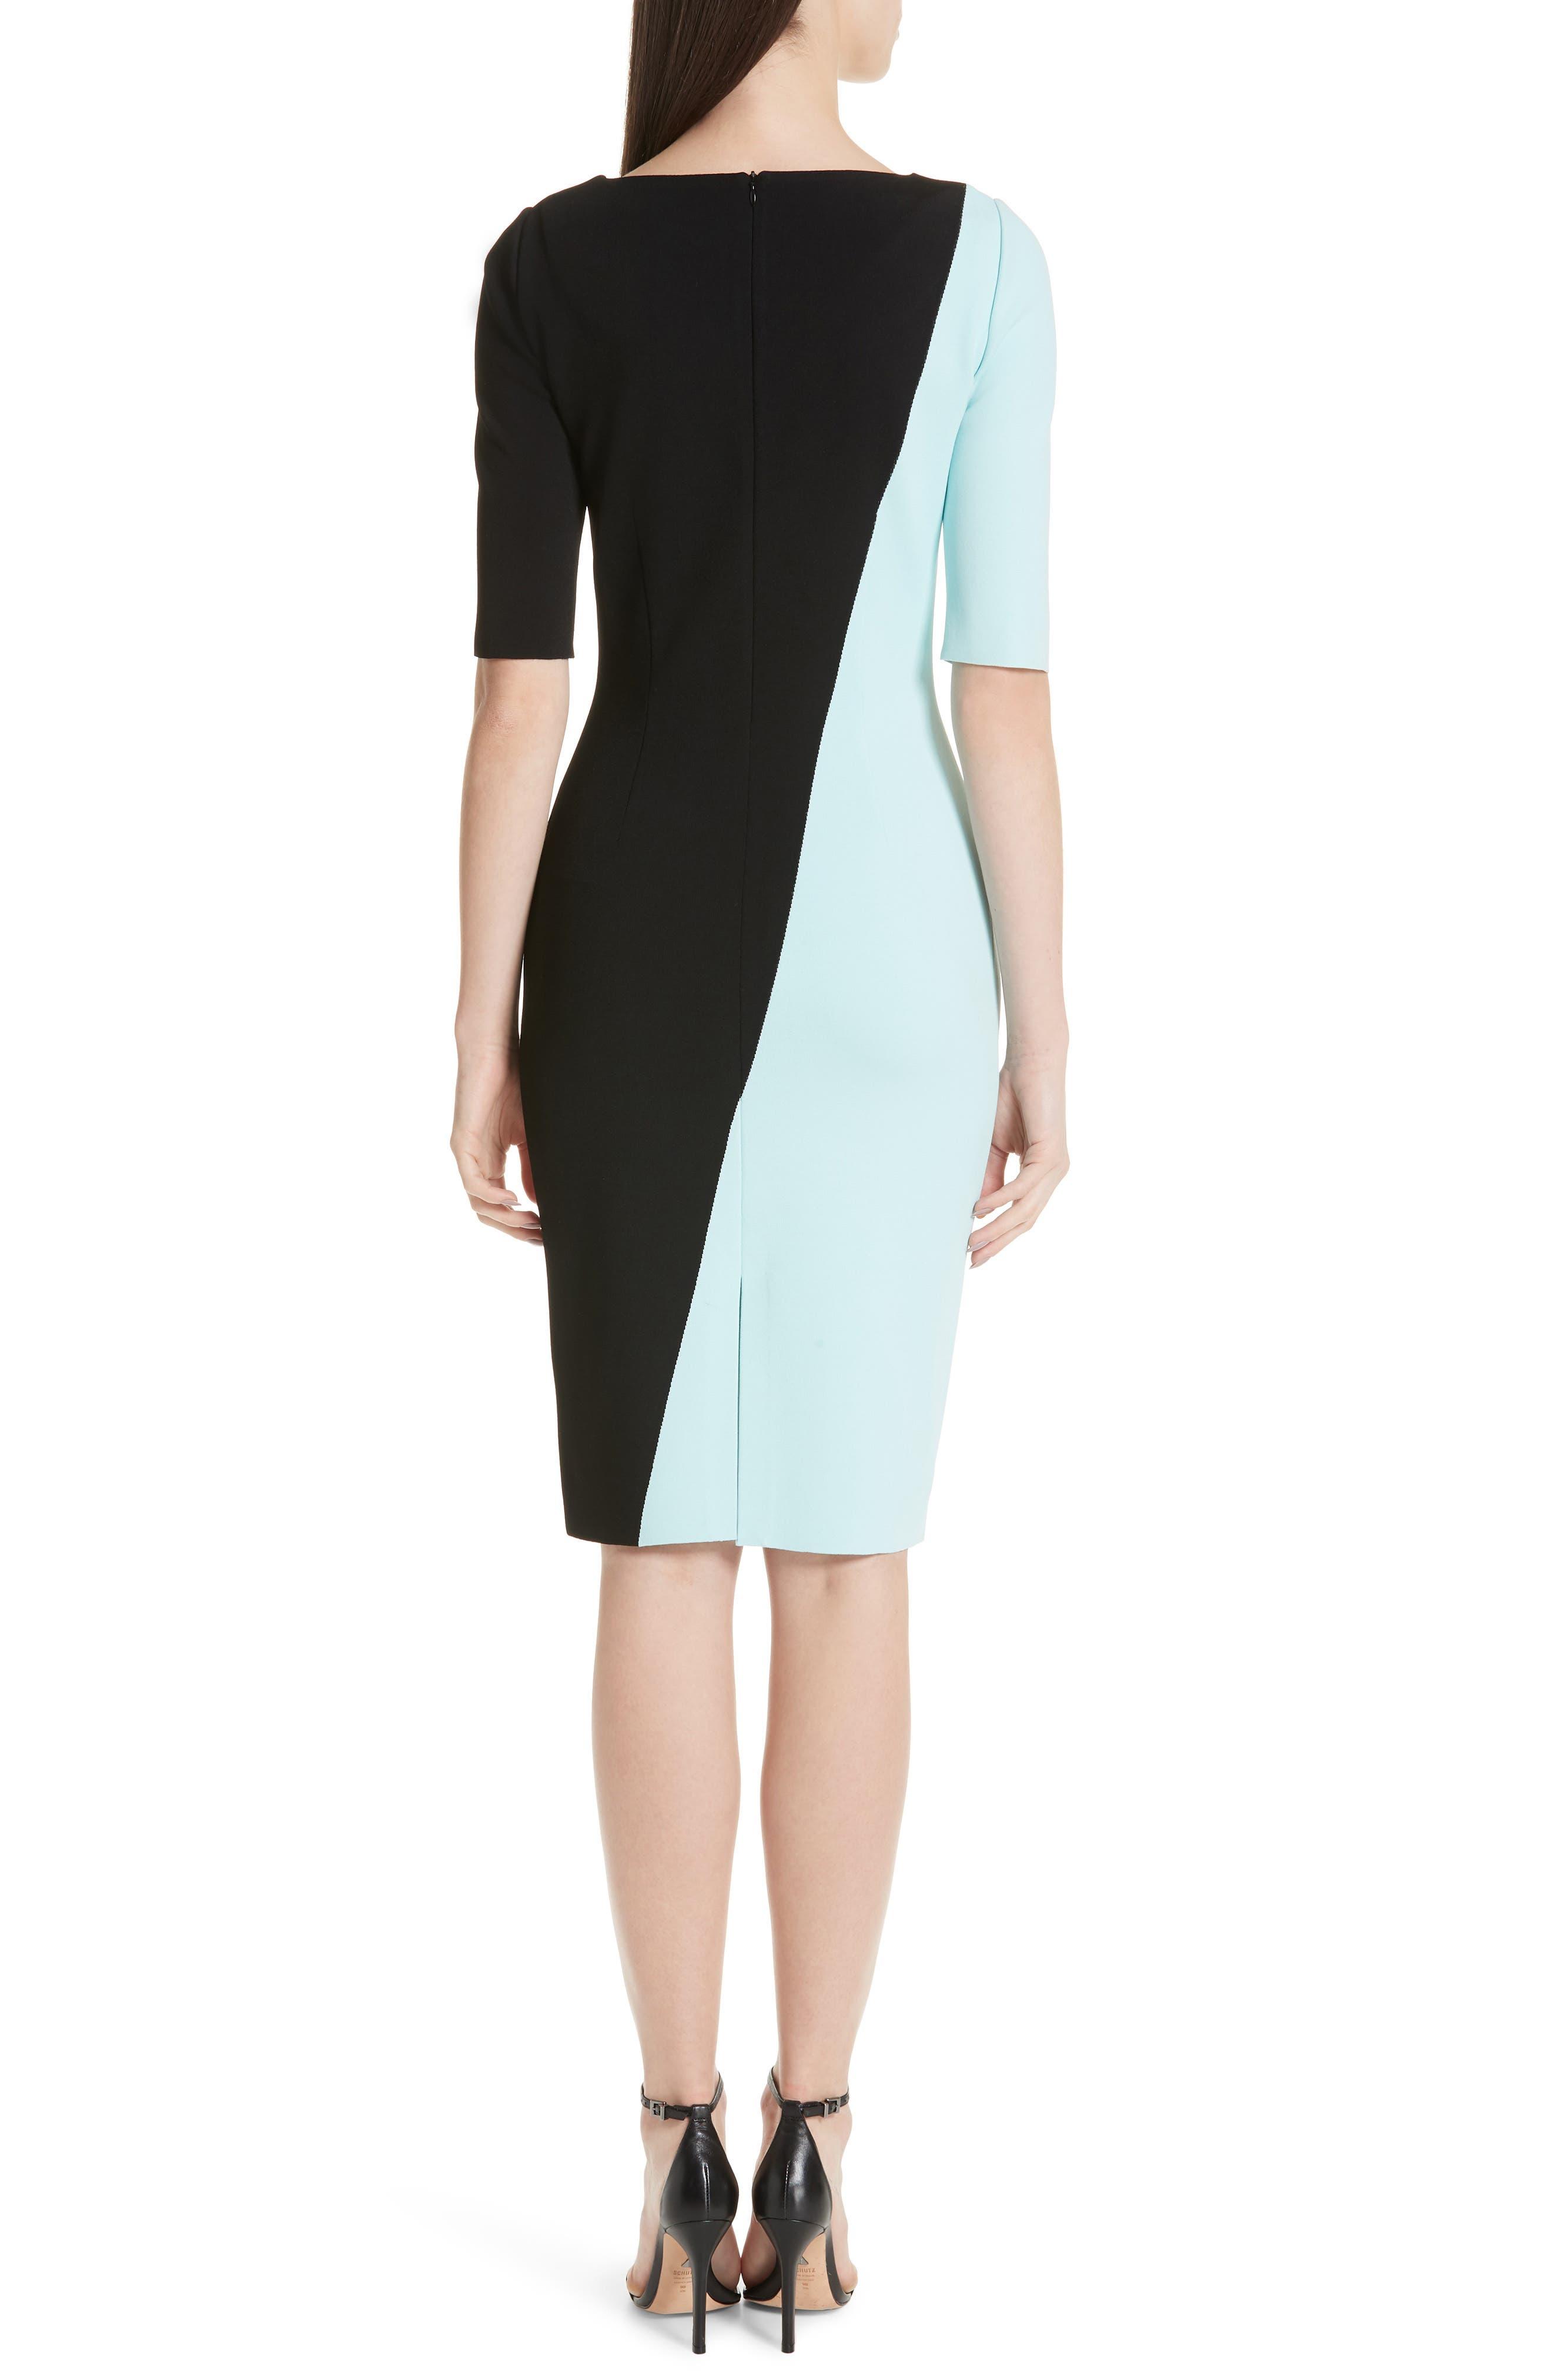 ST. JOHN COLLECTION, Luxe Sculpture Knit Dress, Alternate thumbnail 2, color, SEAFOAM/ CAVIAR